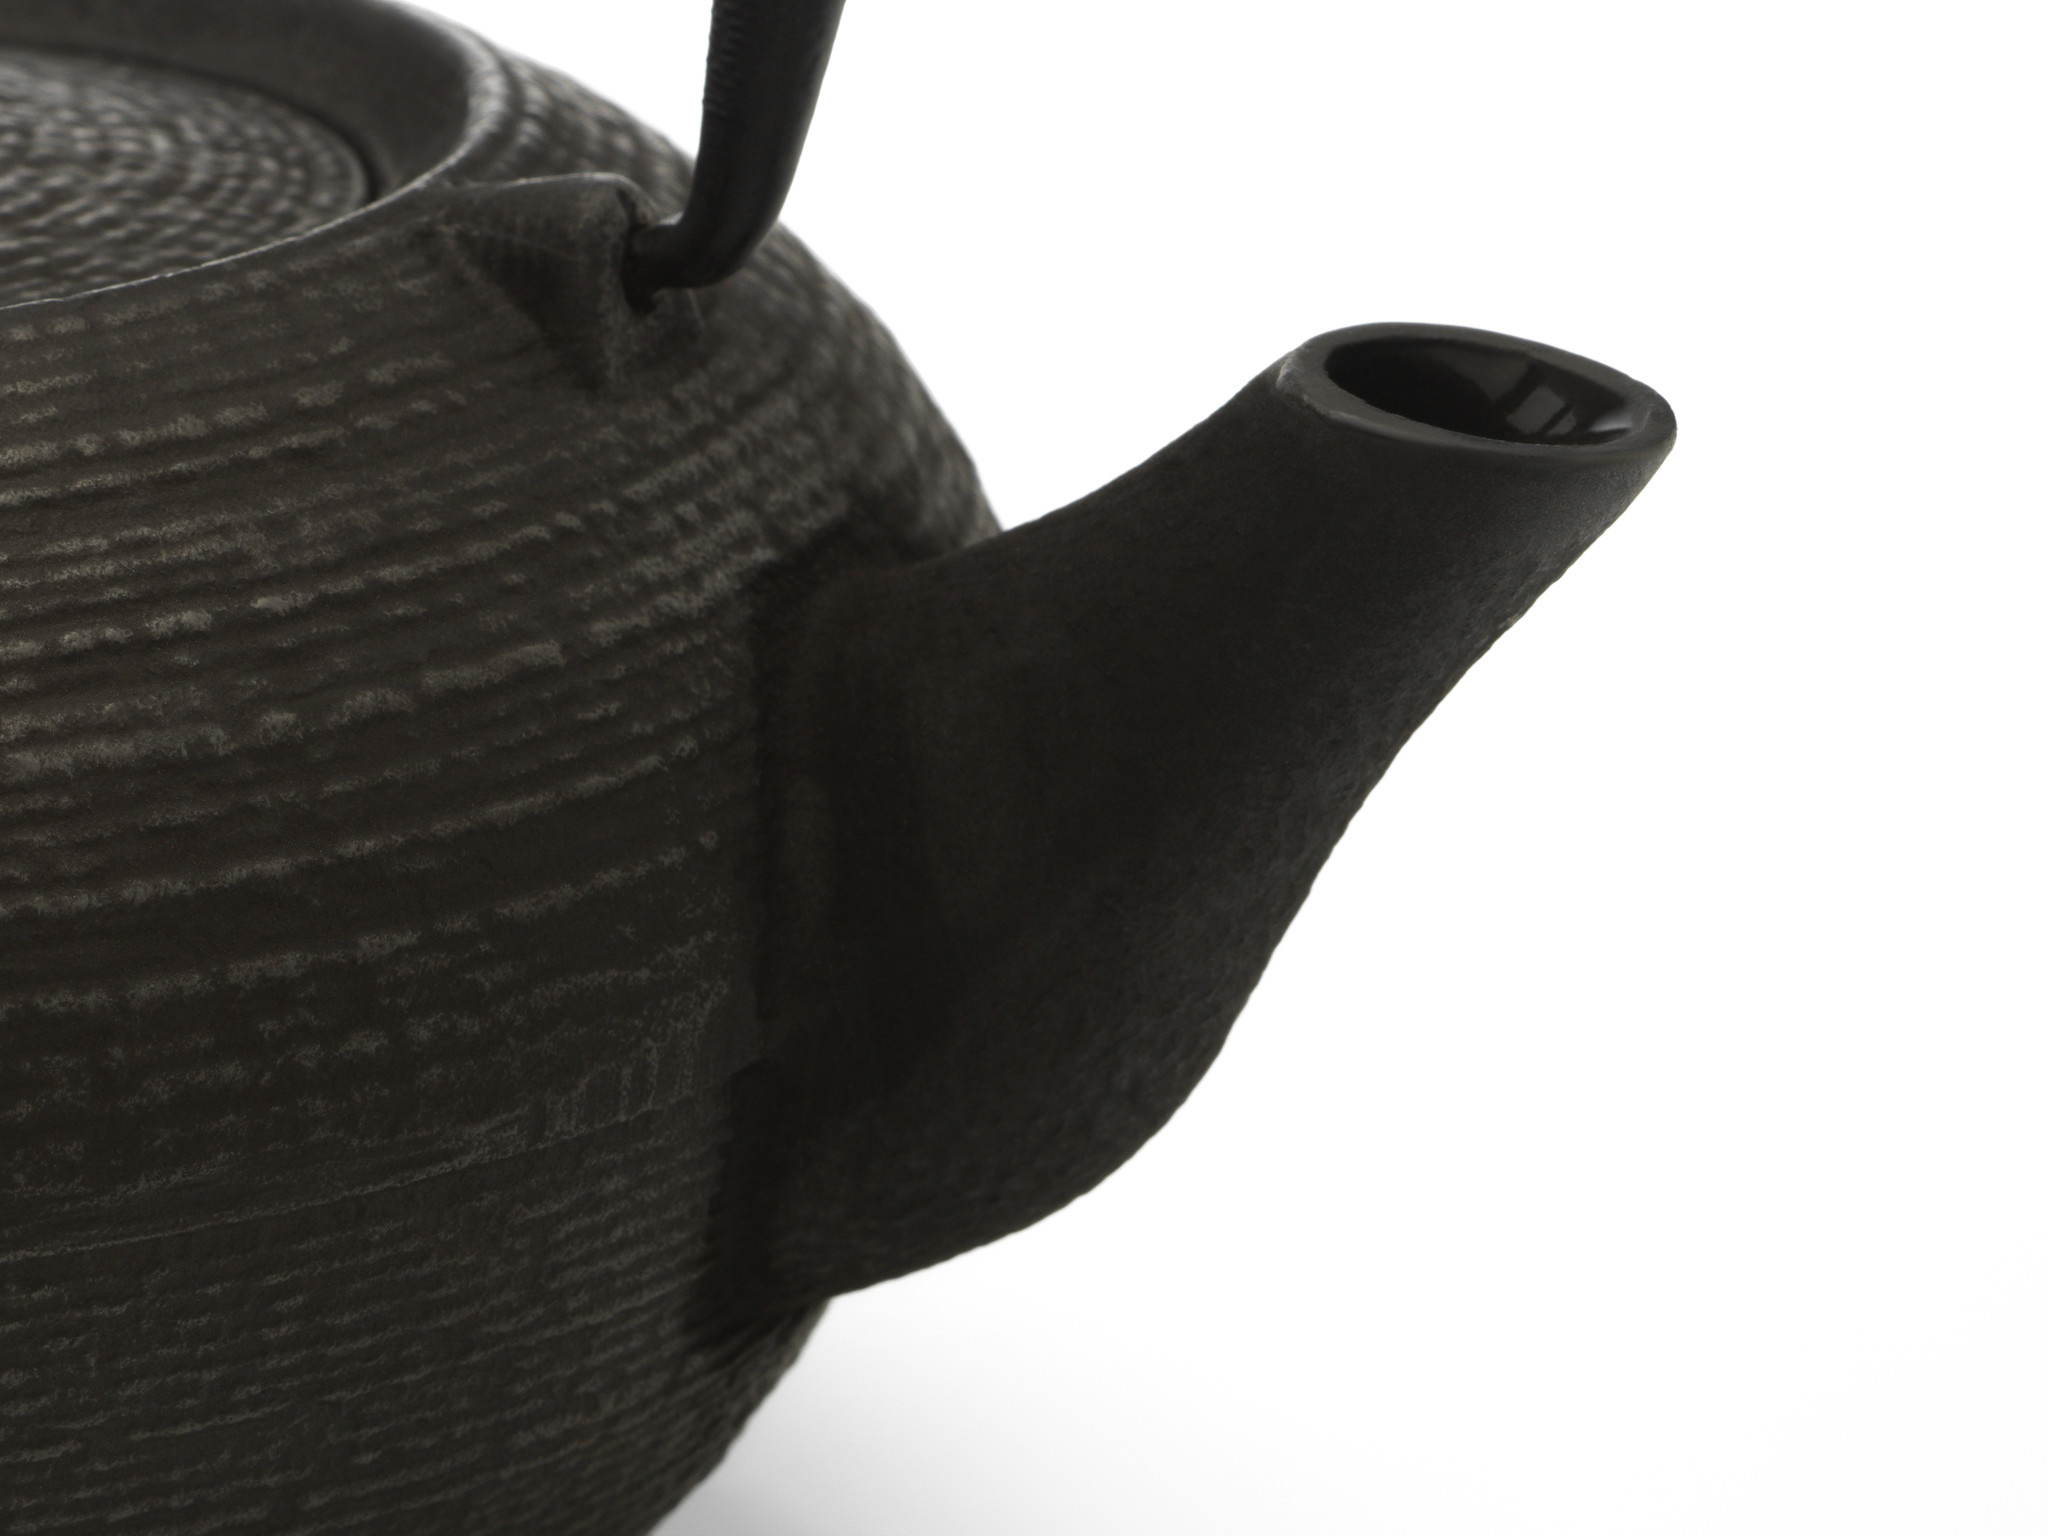 Bredemeijer Theepot Tibet 1.2 L gietijzer zwart